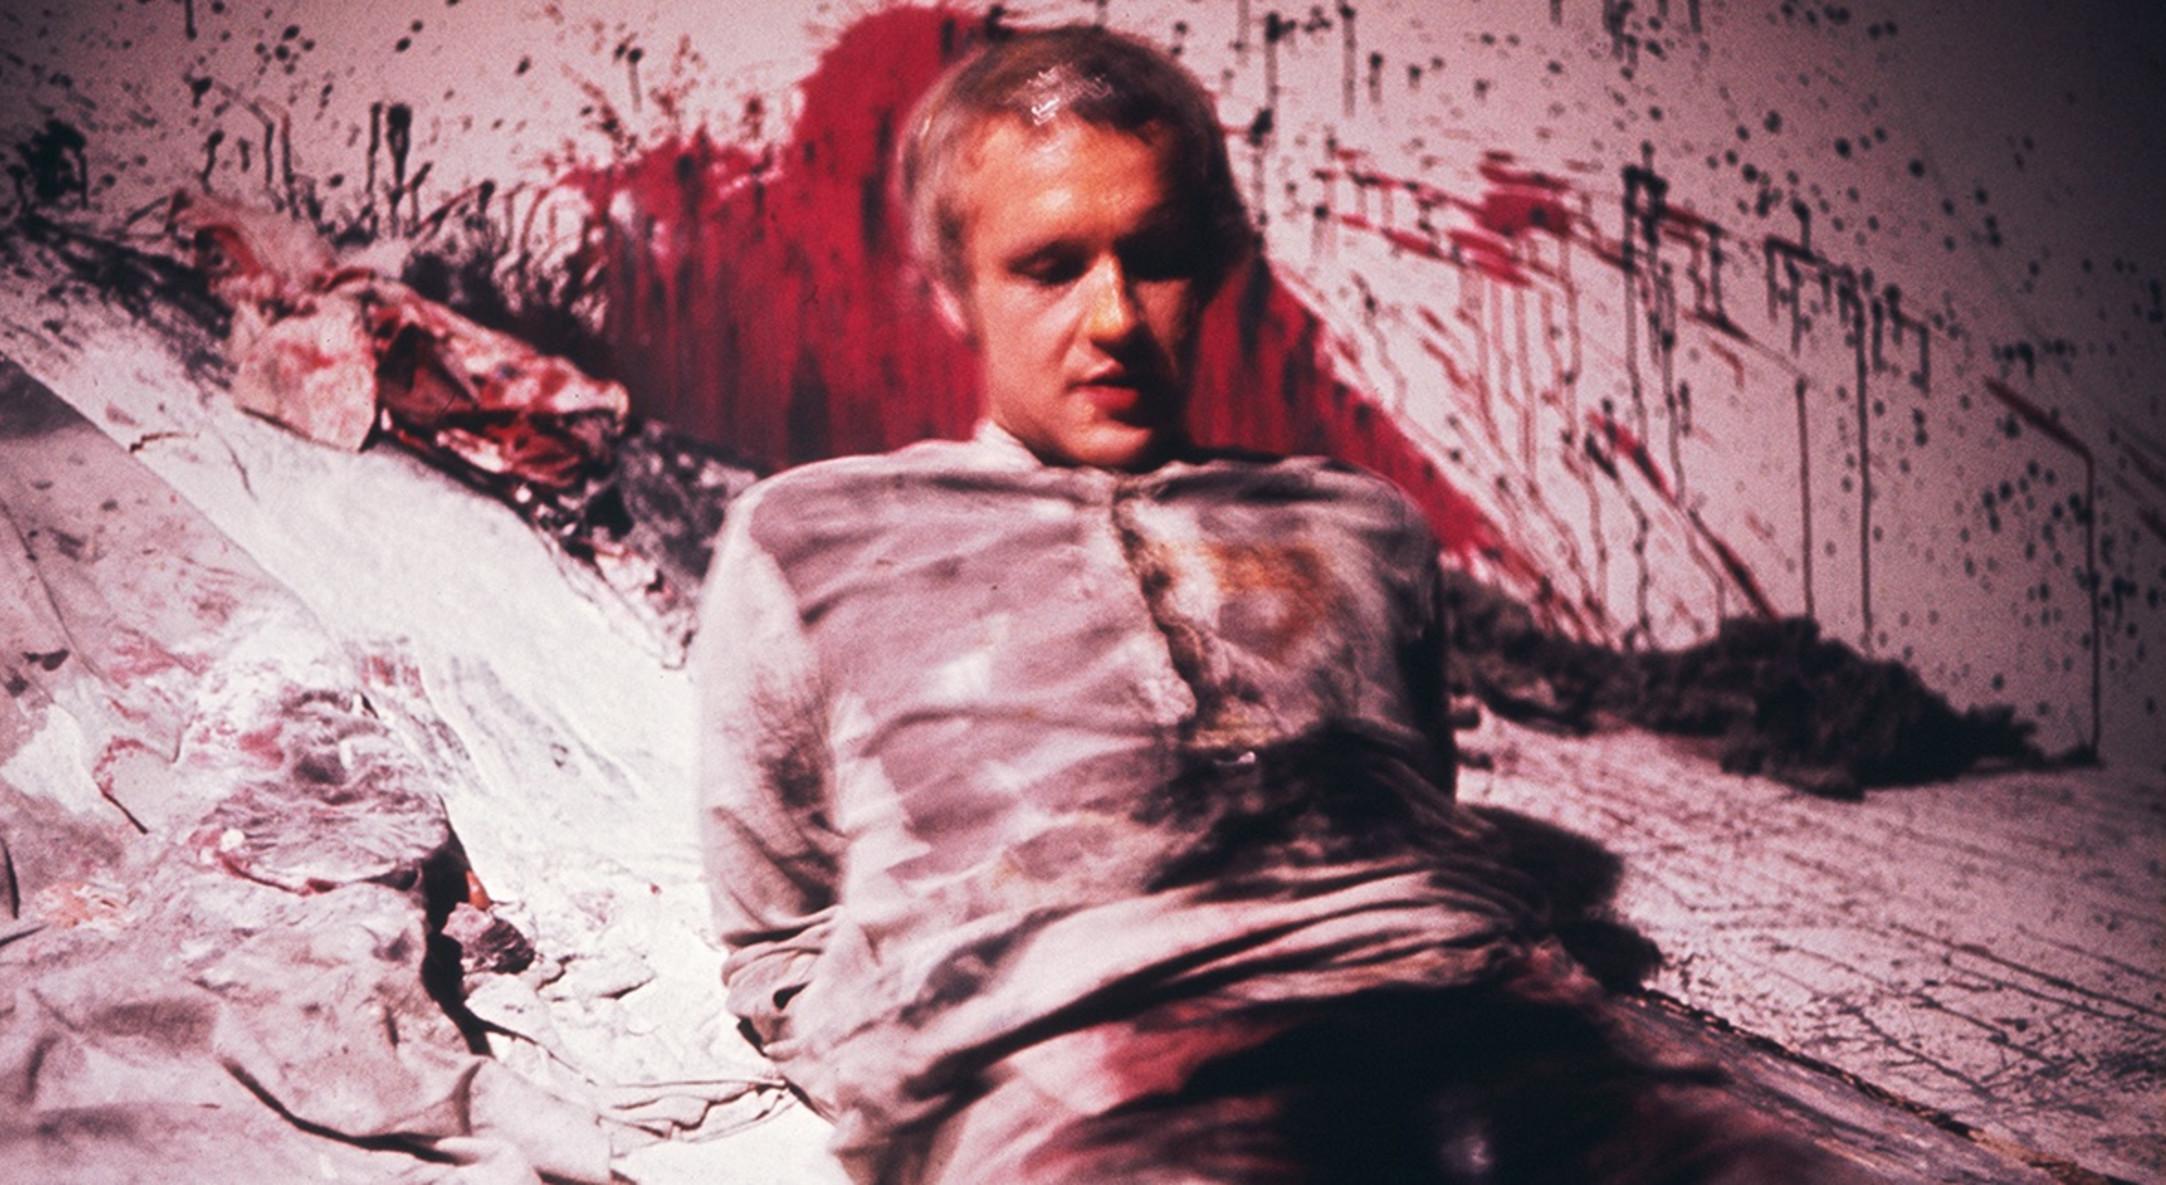 Stuart Brisley, Artist as Whore, 1972, Performance, Gallery House, London. Image courtesy of the Artist and Hales Gallery London. Copyright of the Artist